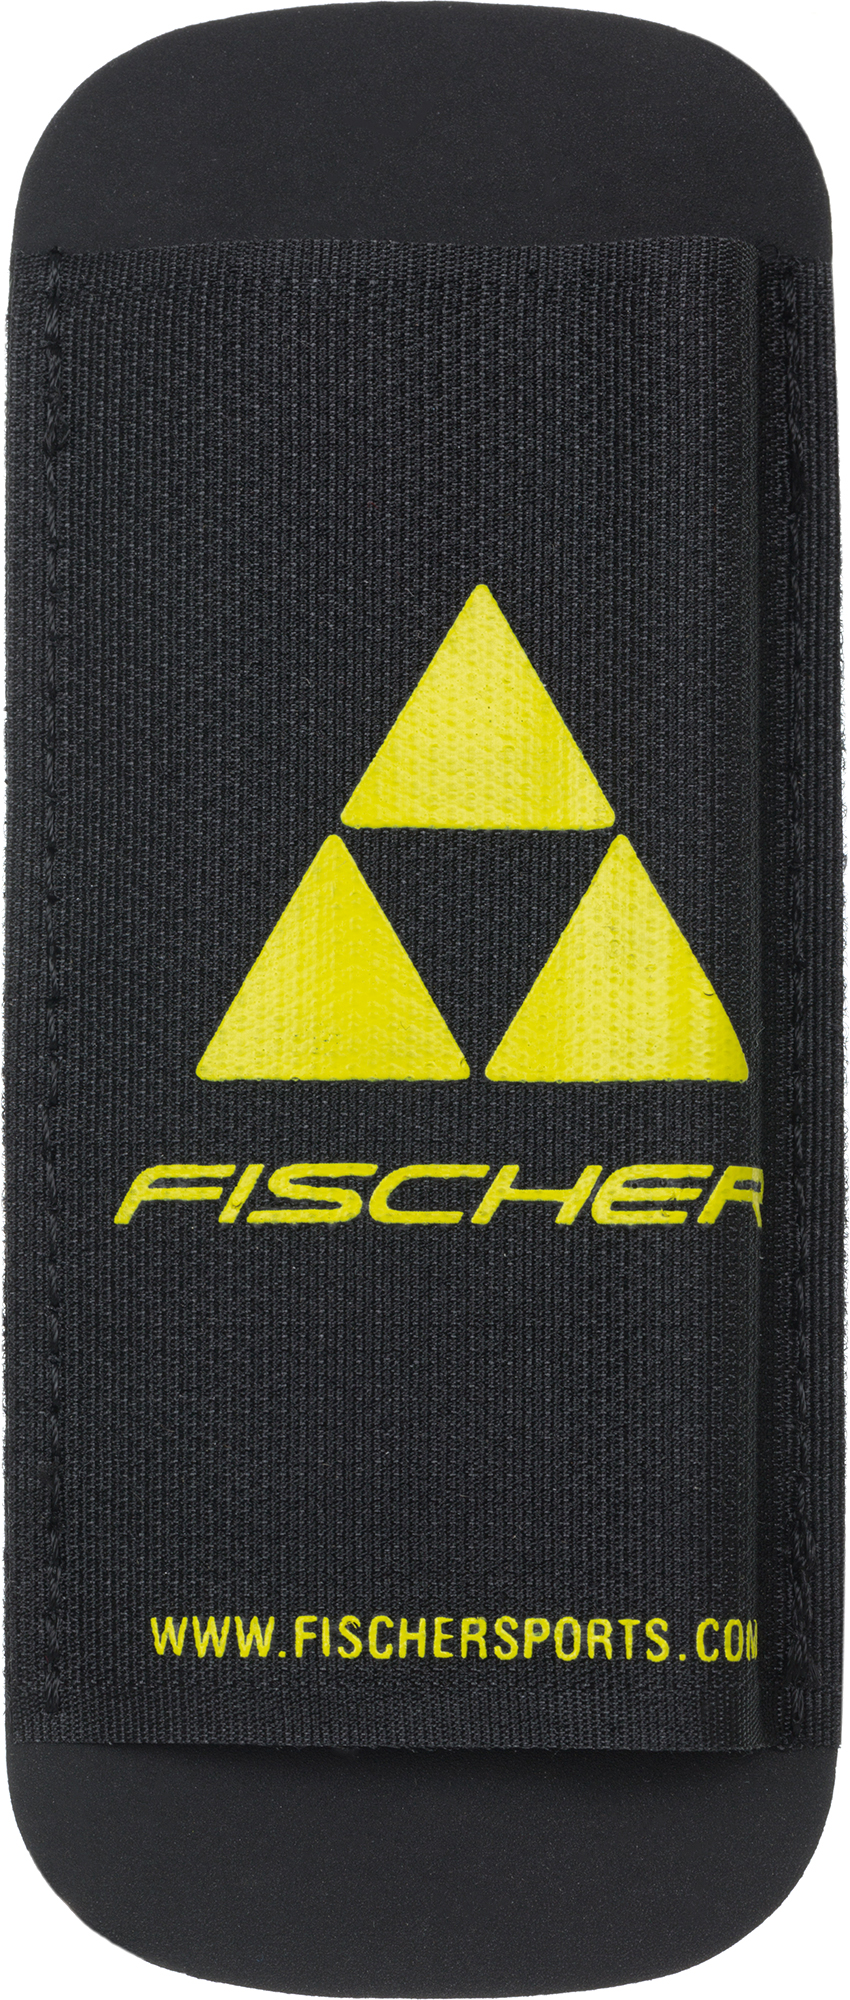 Fischer Связка для беговых лыж